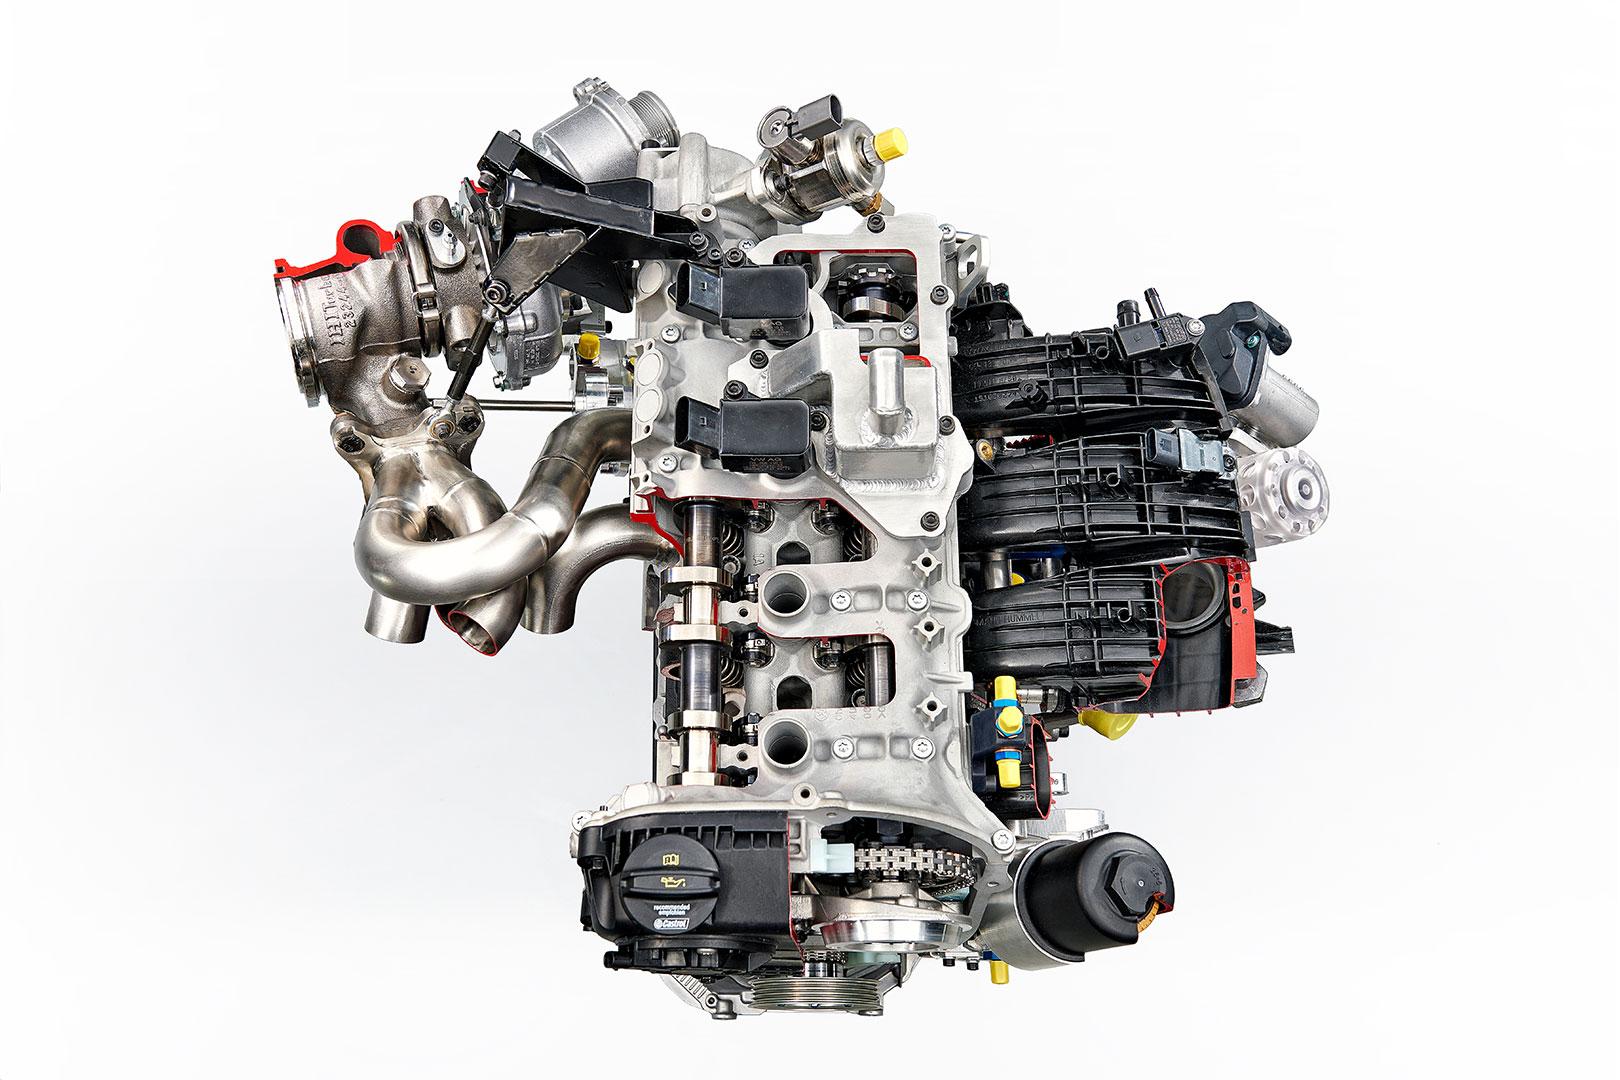 ŠKODA FABIA R5 - Motor